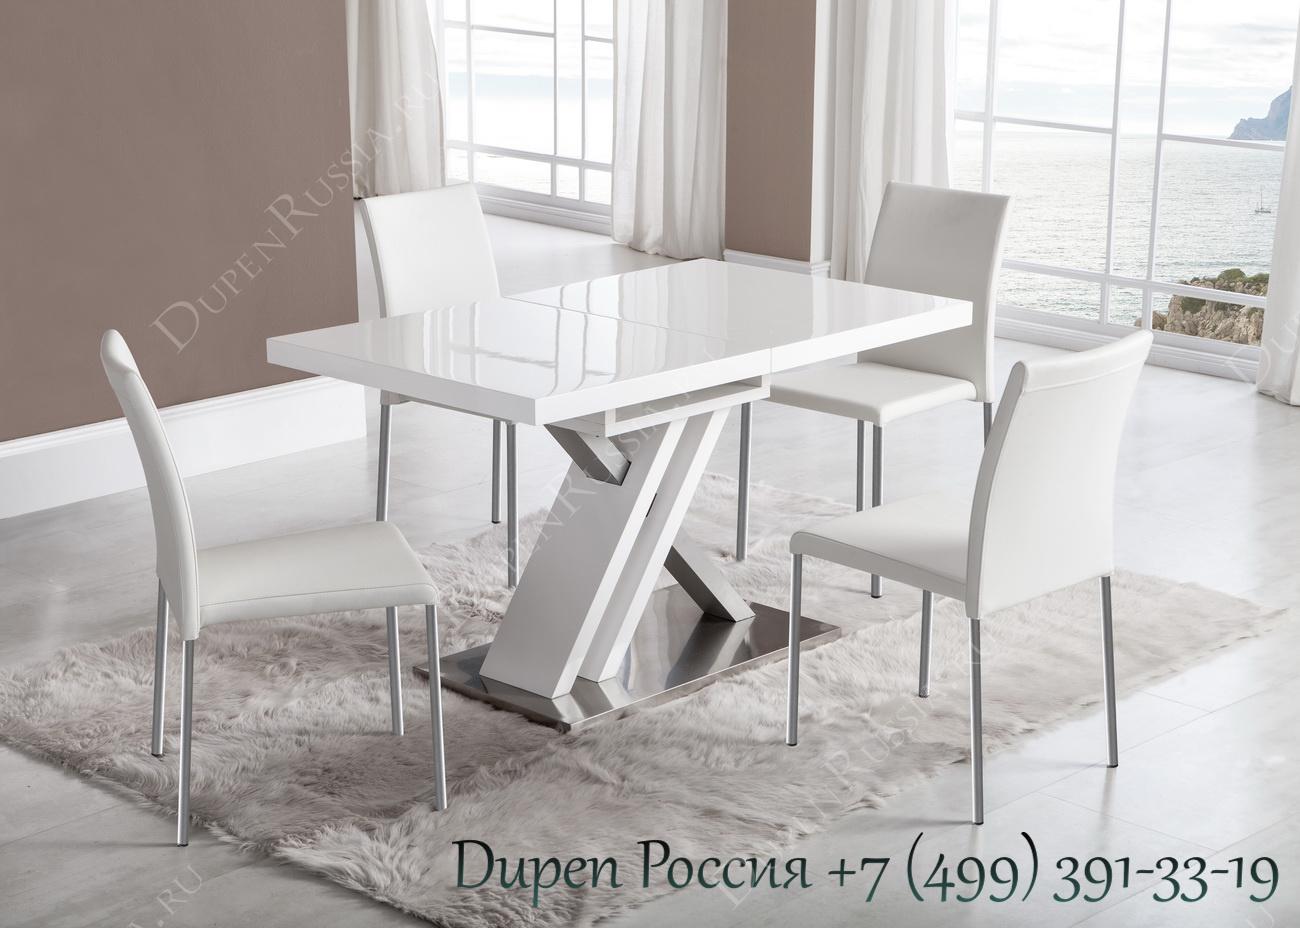 Стол DUPEN DT-16, Стул DUPEN DC-106